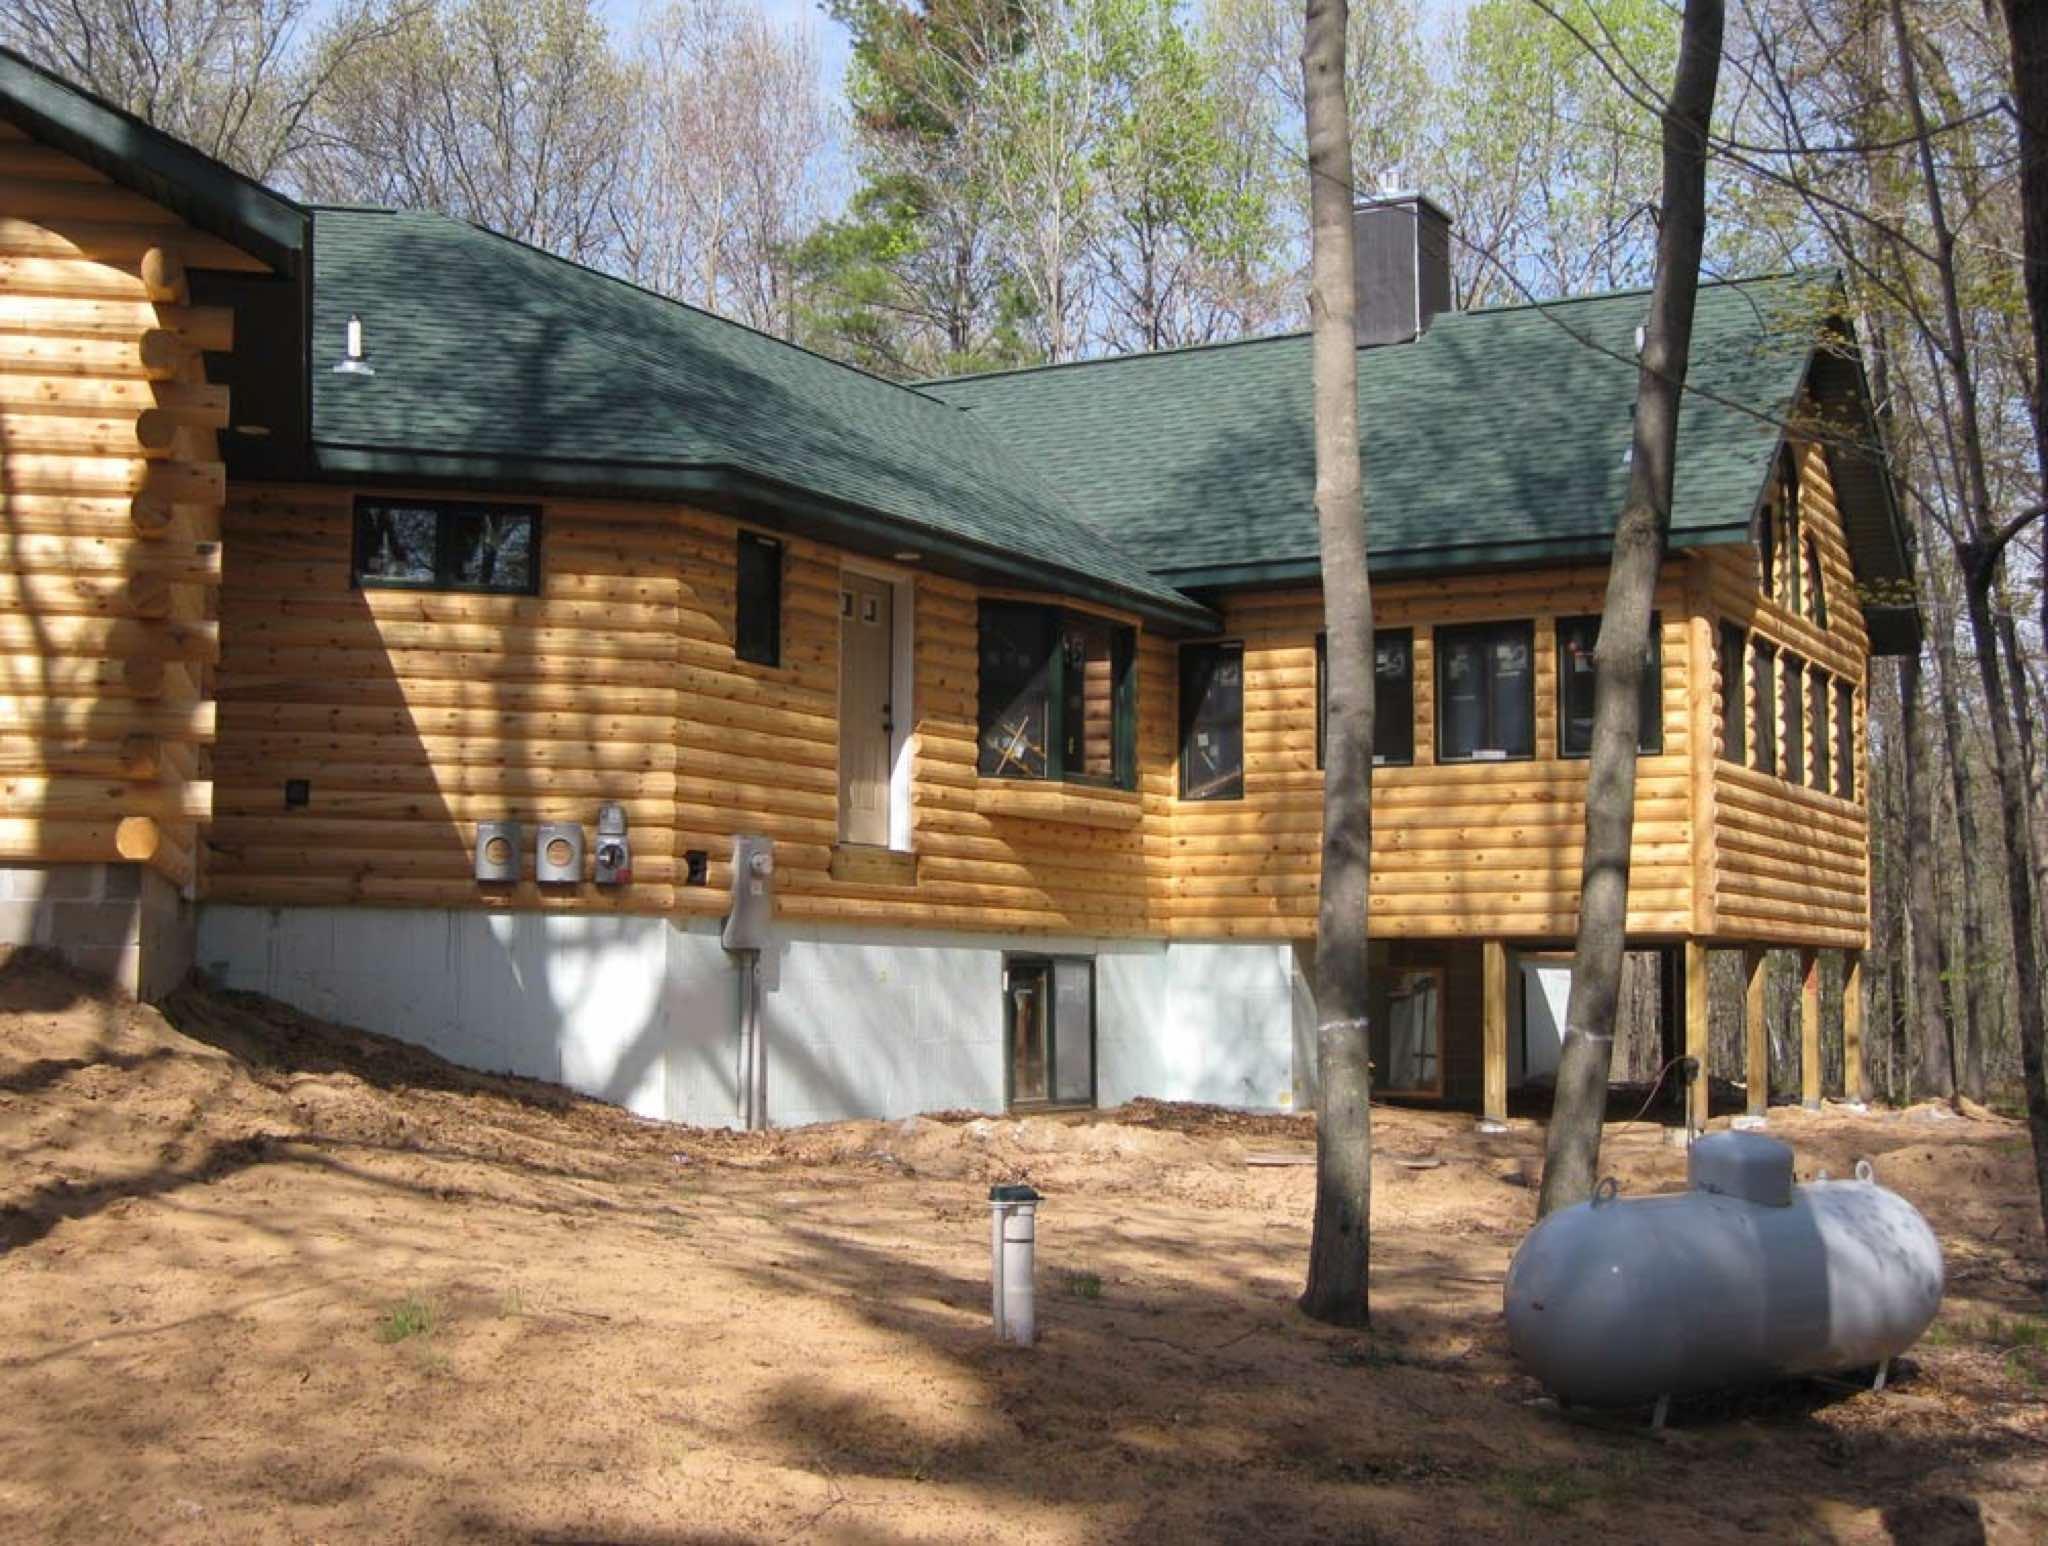 kits home log manufacturer cavareno manufacturers improvment cabin cabins galleries